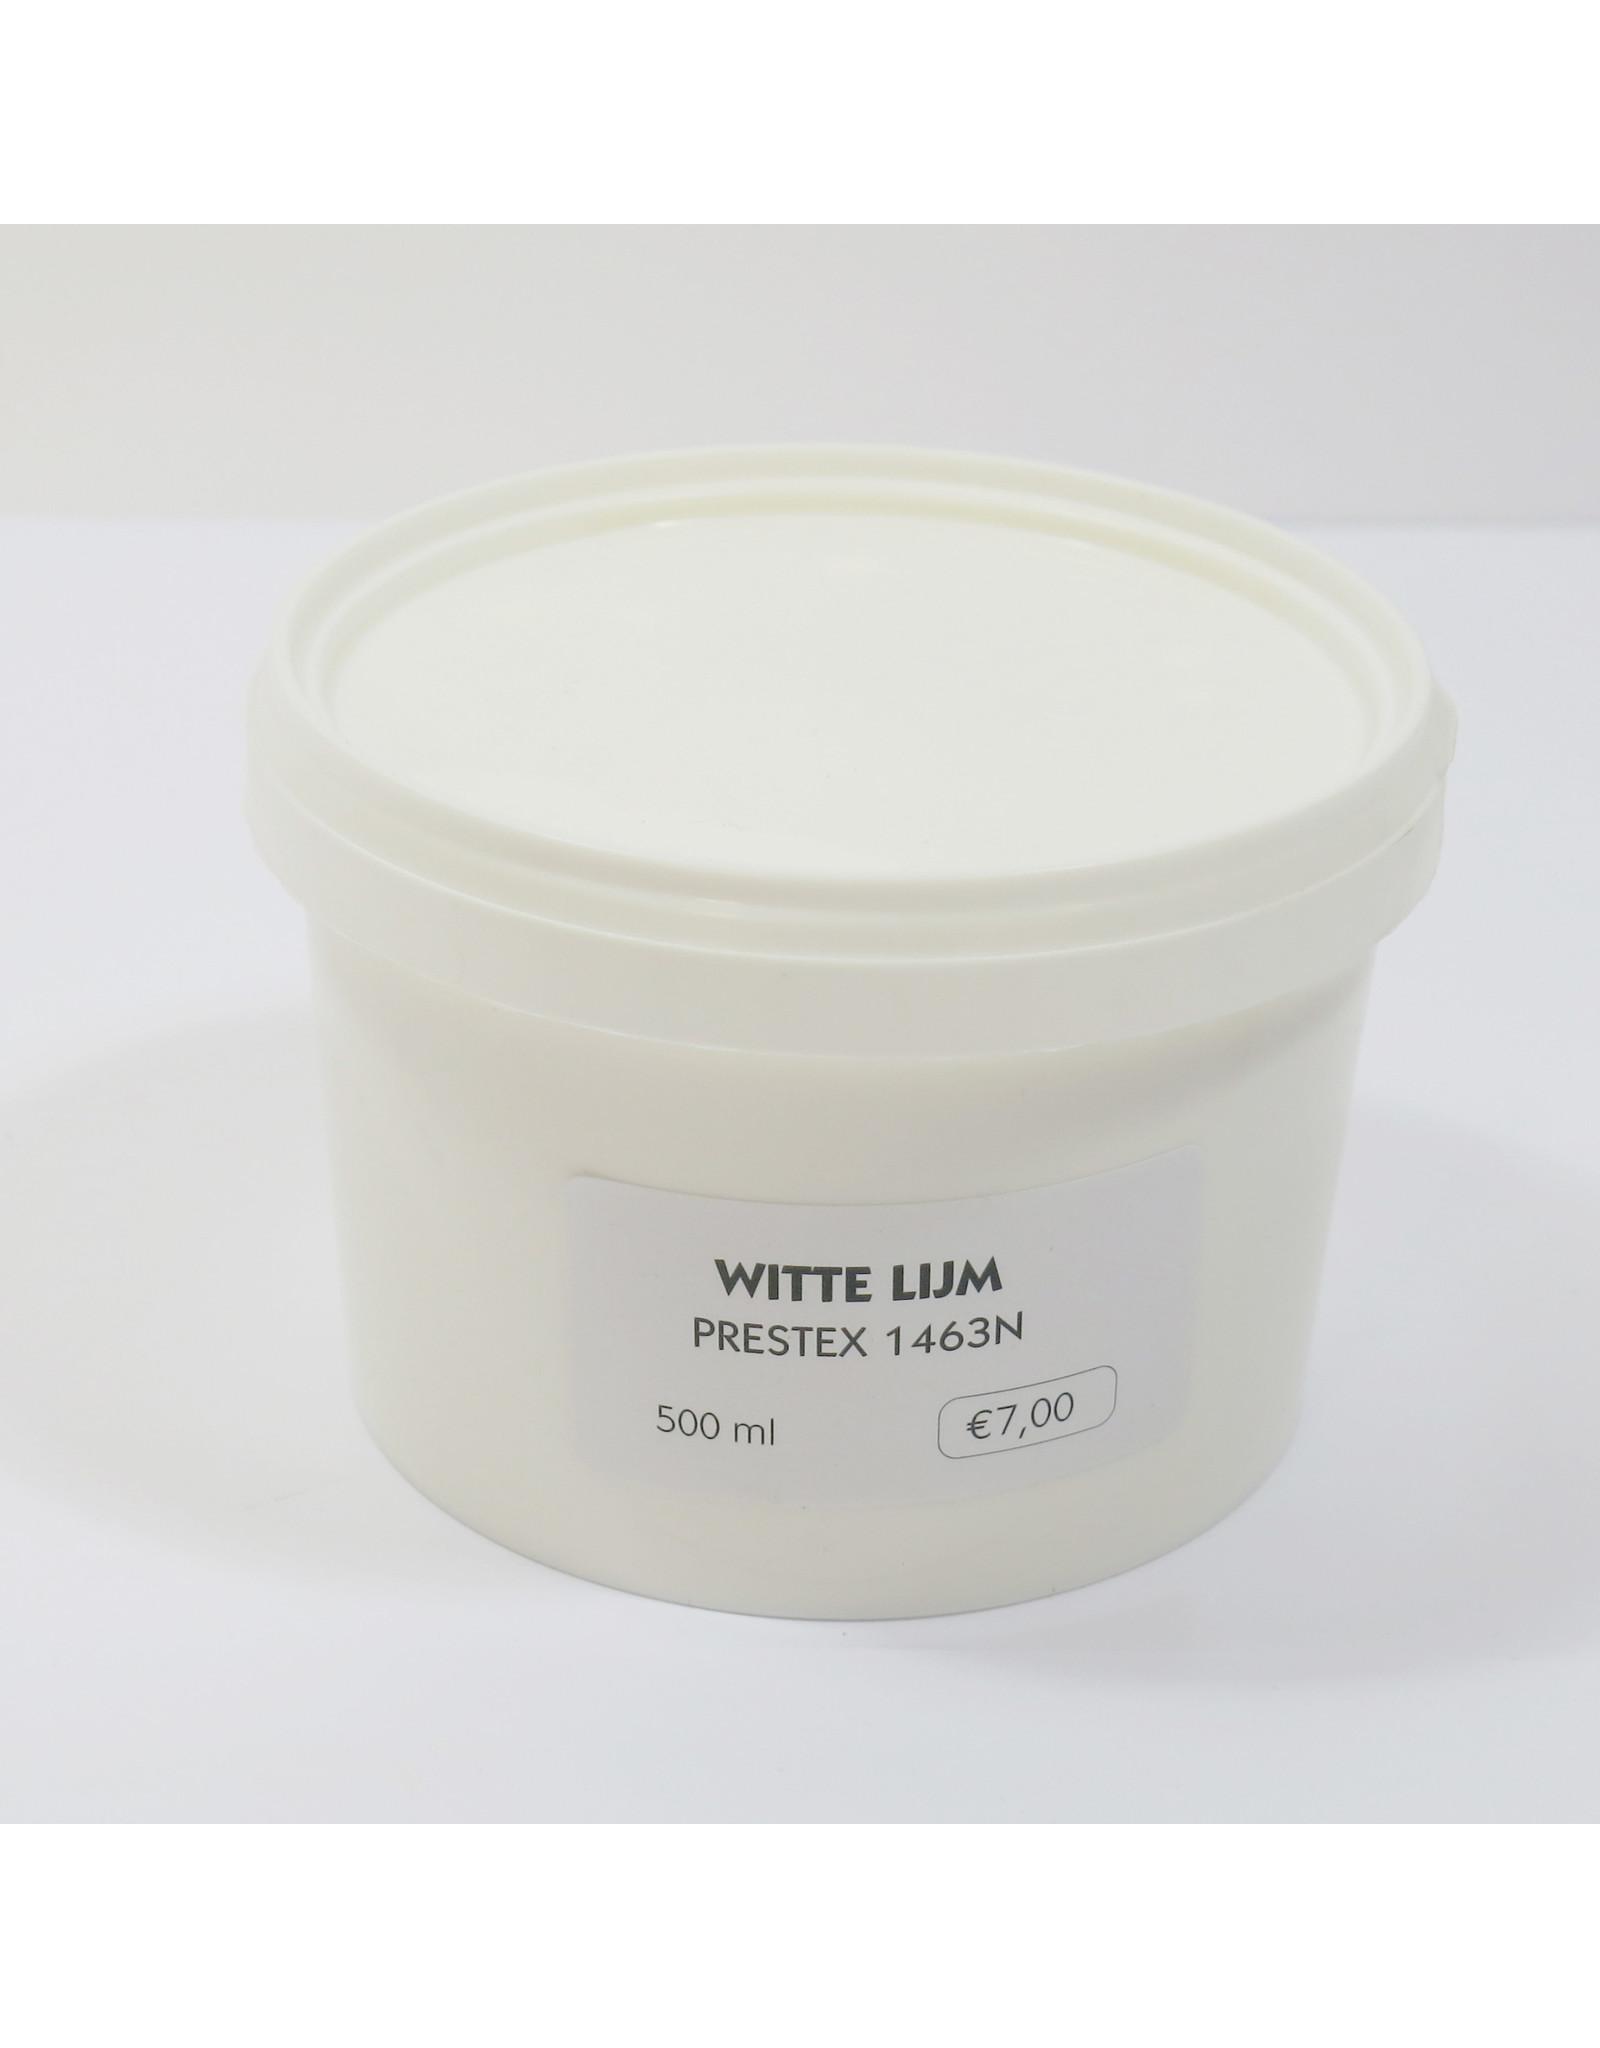 Witte lijm - Prestex 1463N